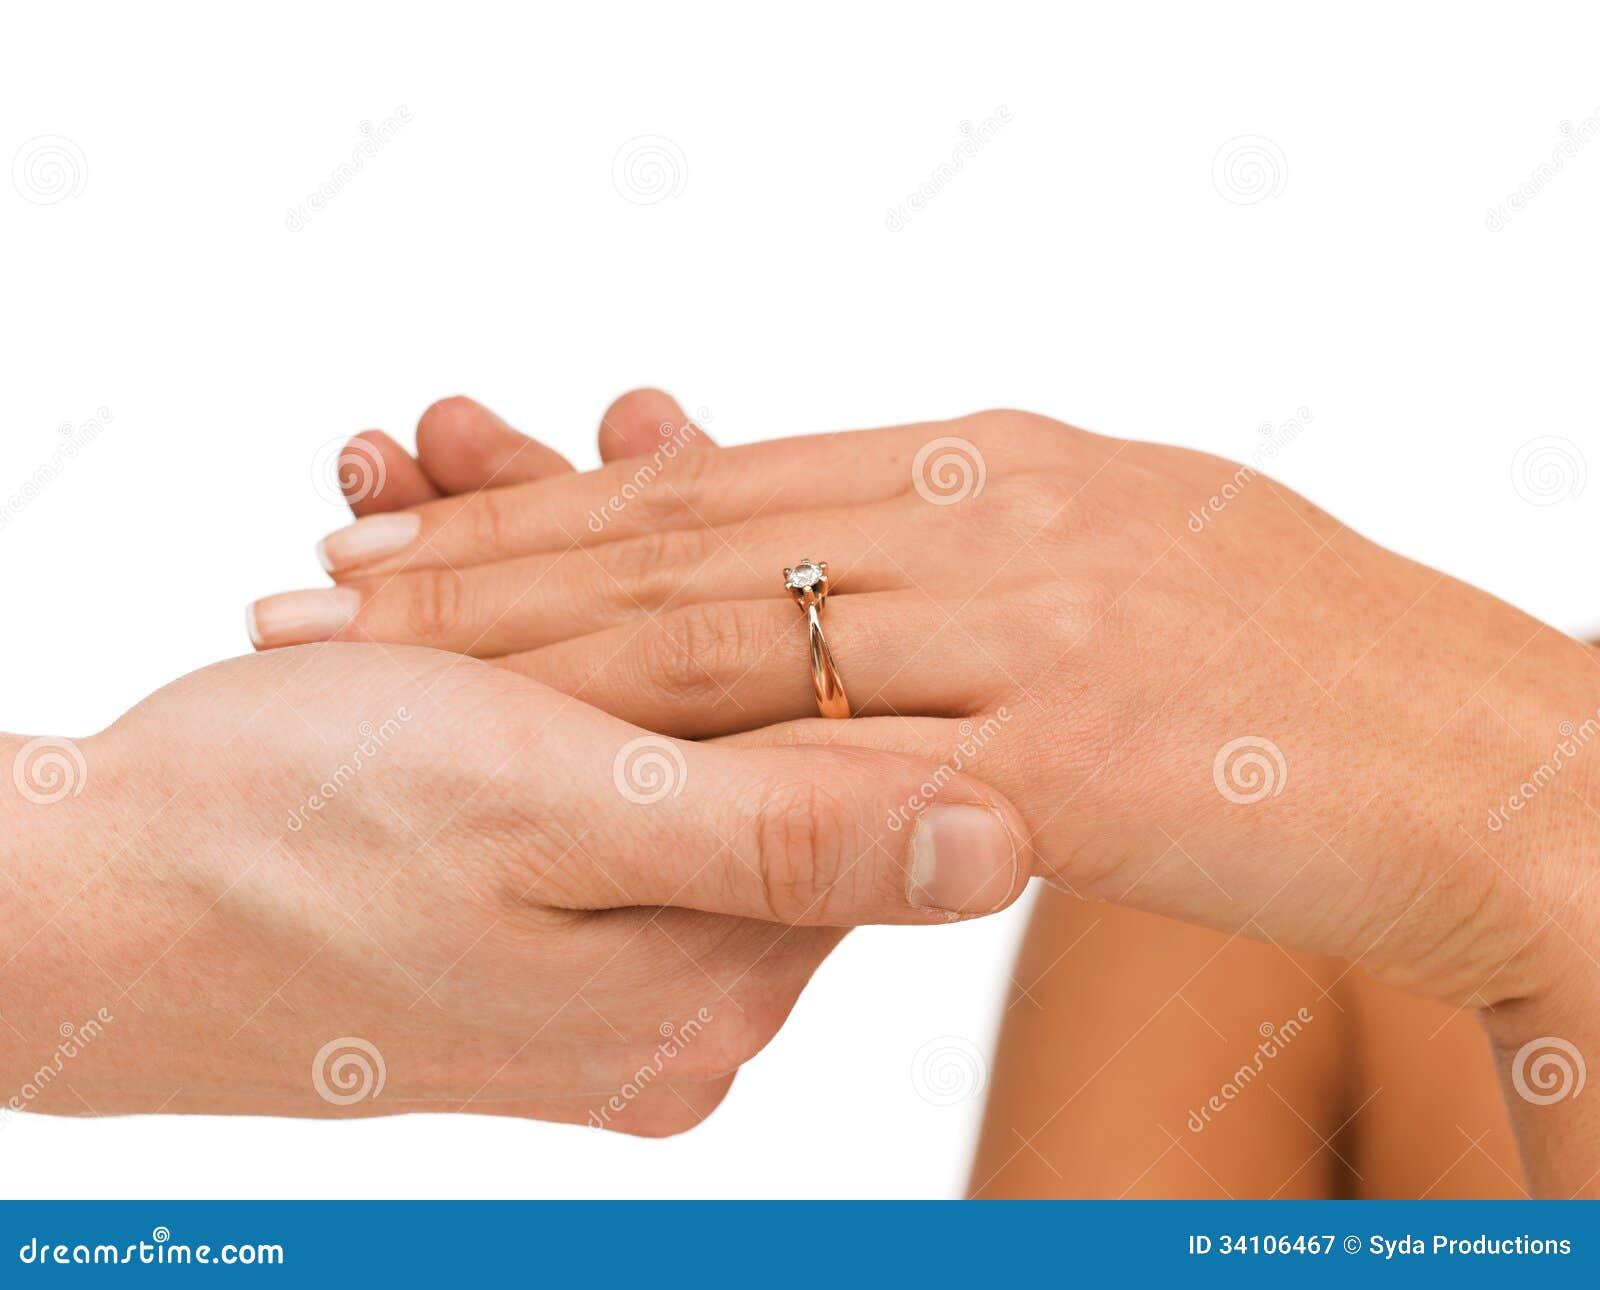 Man Puts Wedding Ring On Woman Hand Stock Image Image